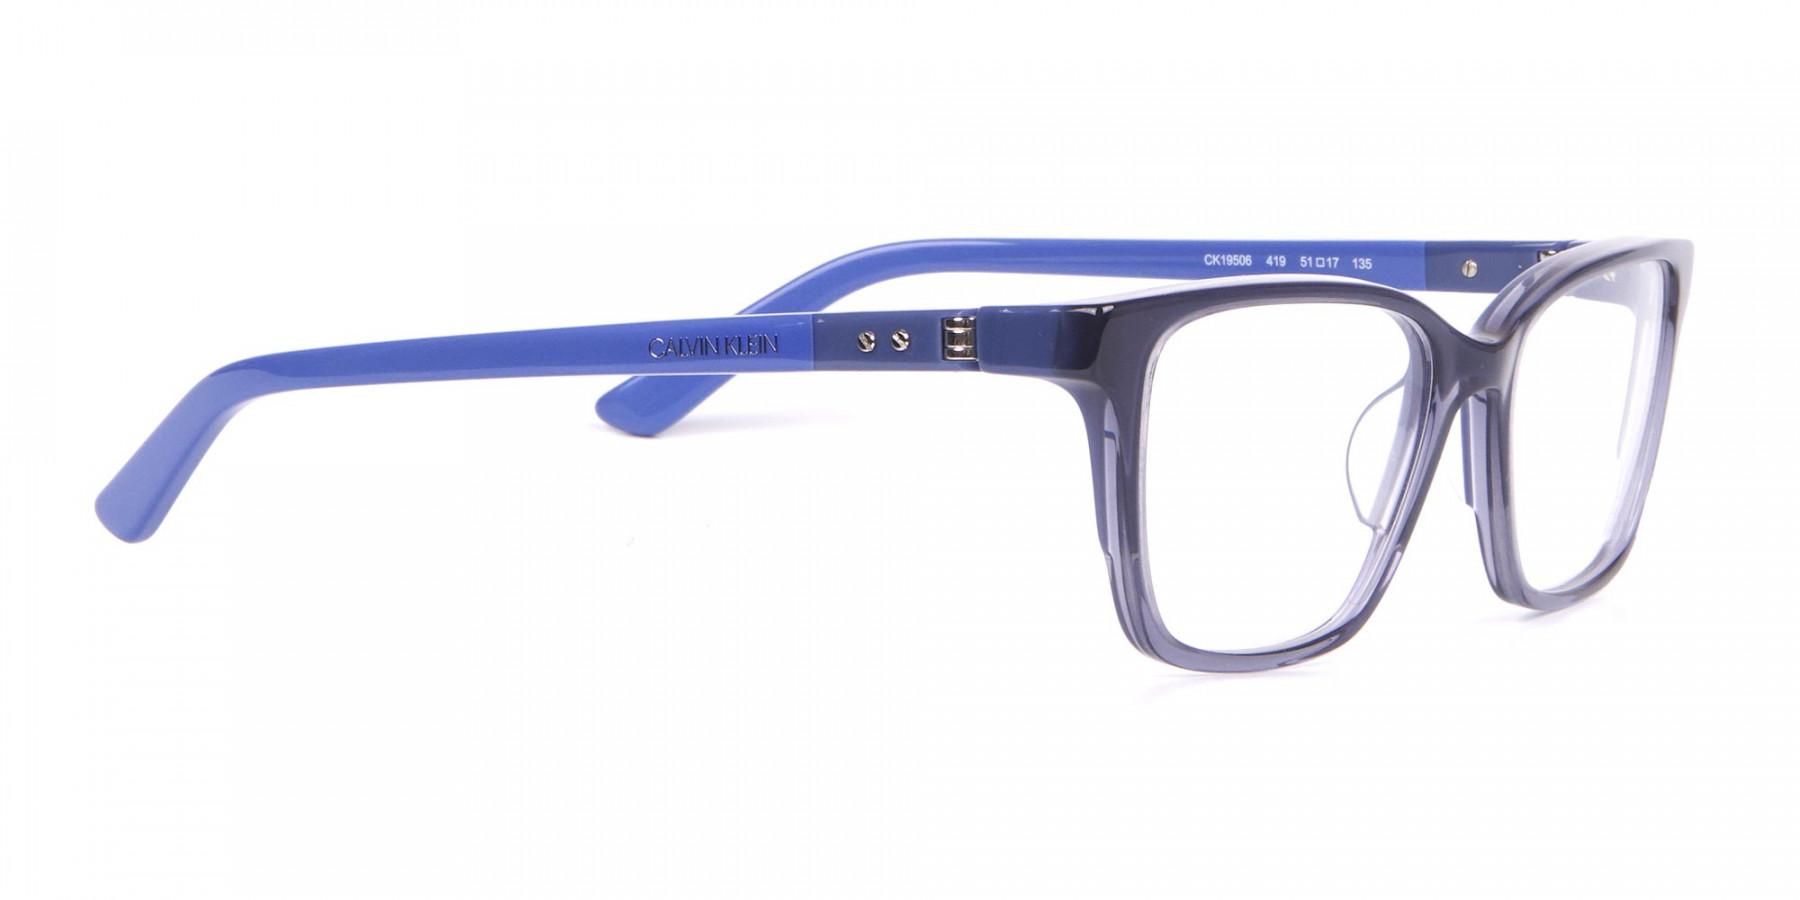 Calvin Klein CK19506 Two-Toned Retangular Glasses In Blue-1